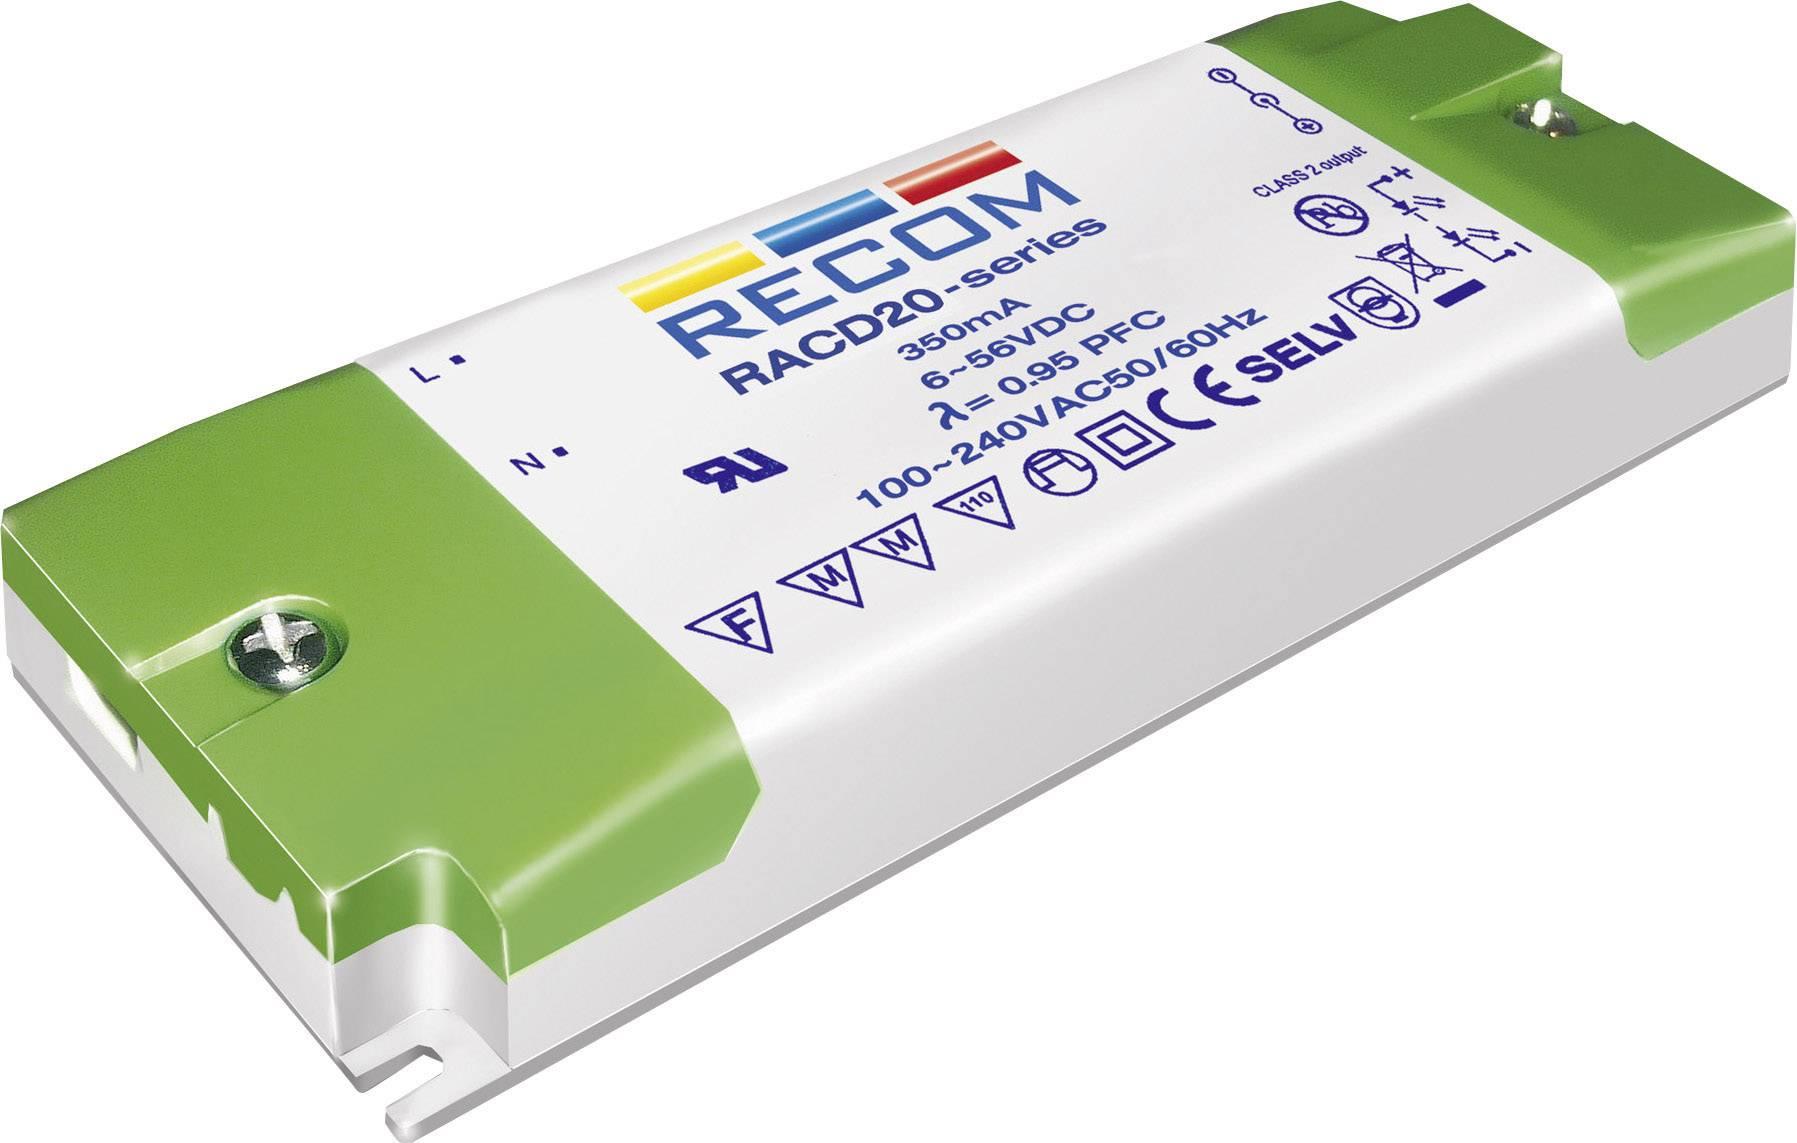 LED driver Recom Lighting RACD20-1050, 20 W (max), 1.05 A, 5 - 17 V/DC